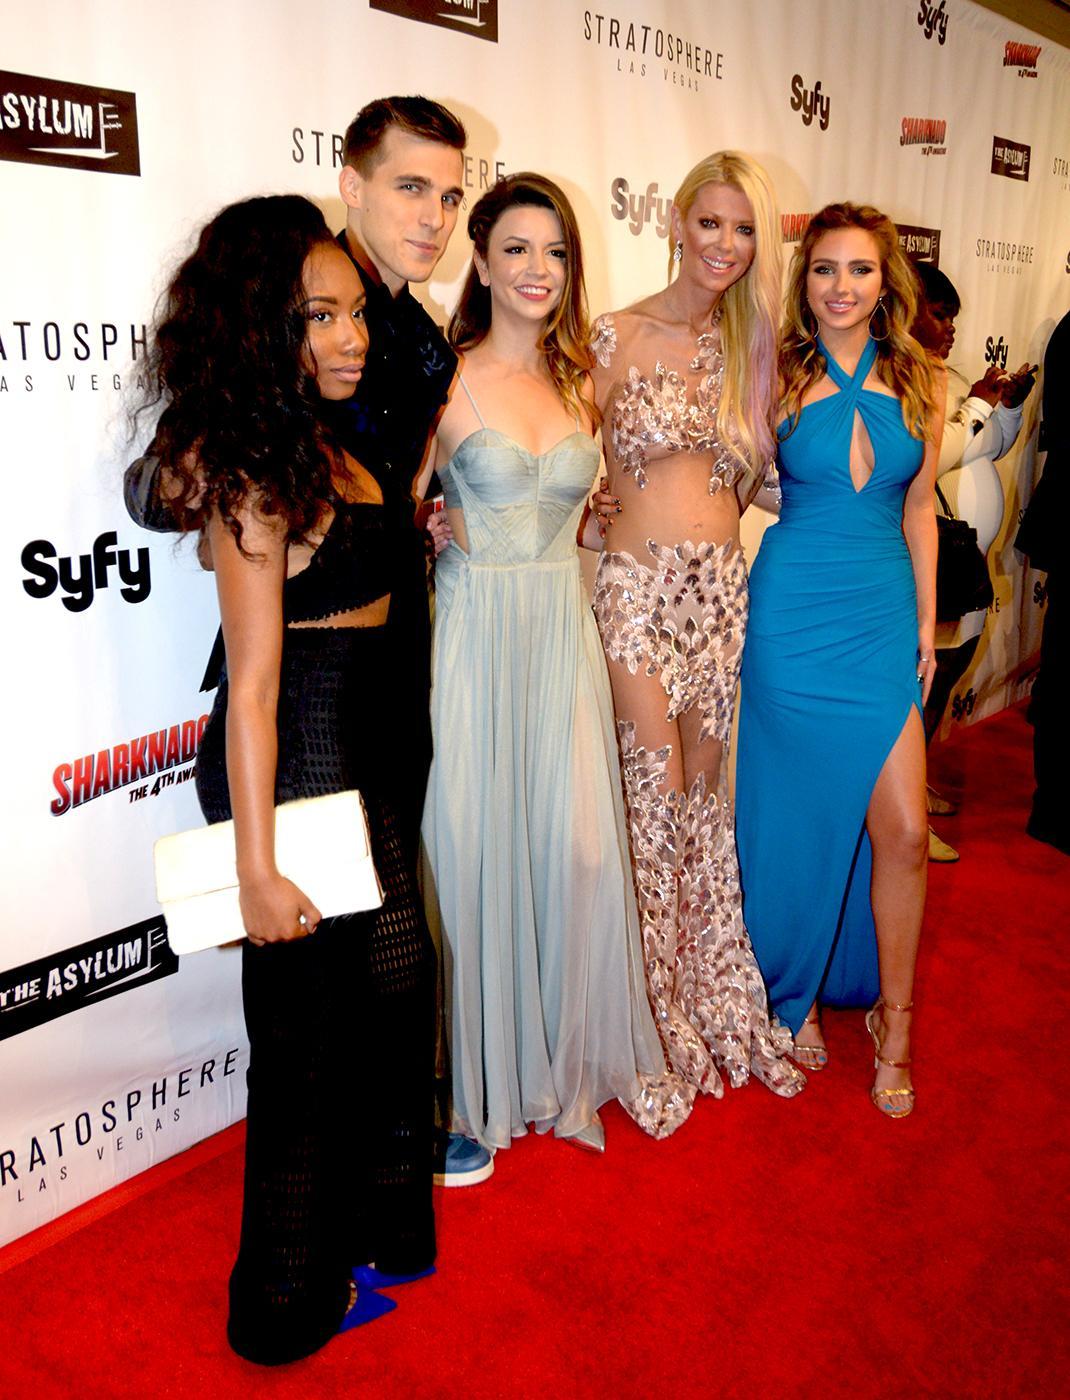 Sharknado Cast Memebers Imani Hakim Cody Linley Masiela Lusha Tara Reid And Ryan